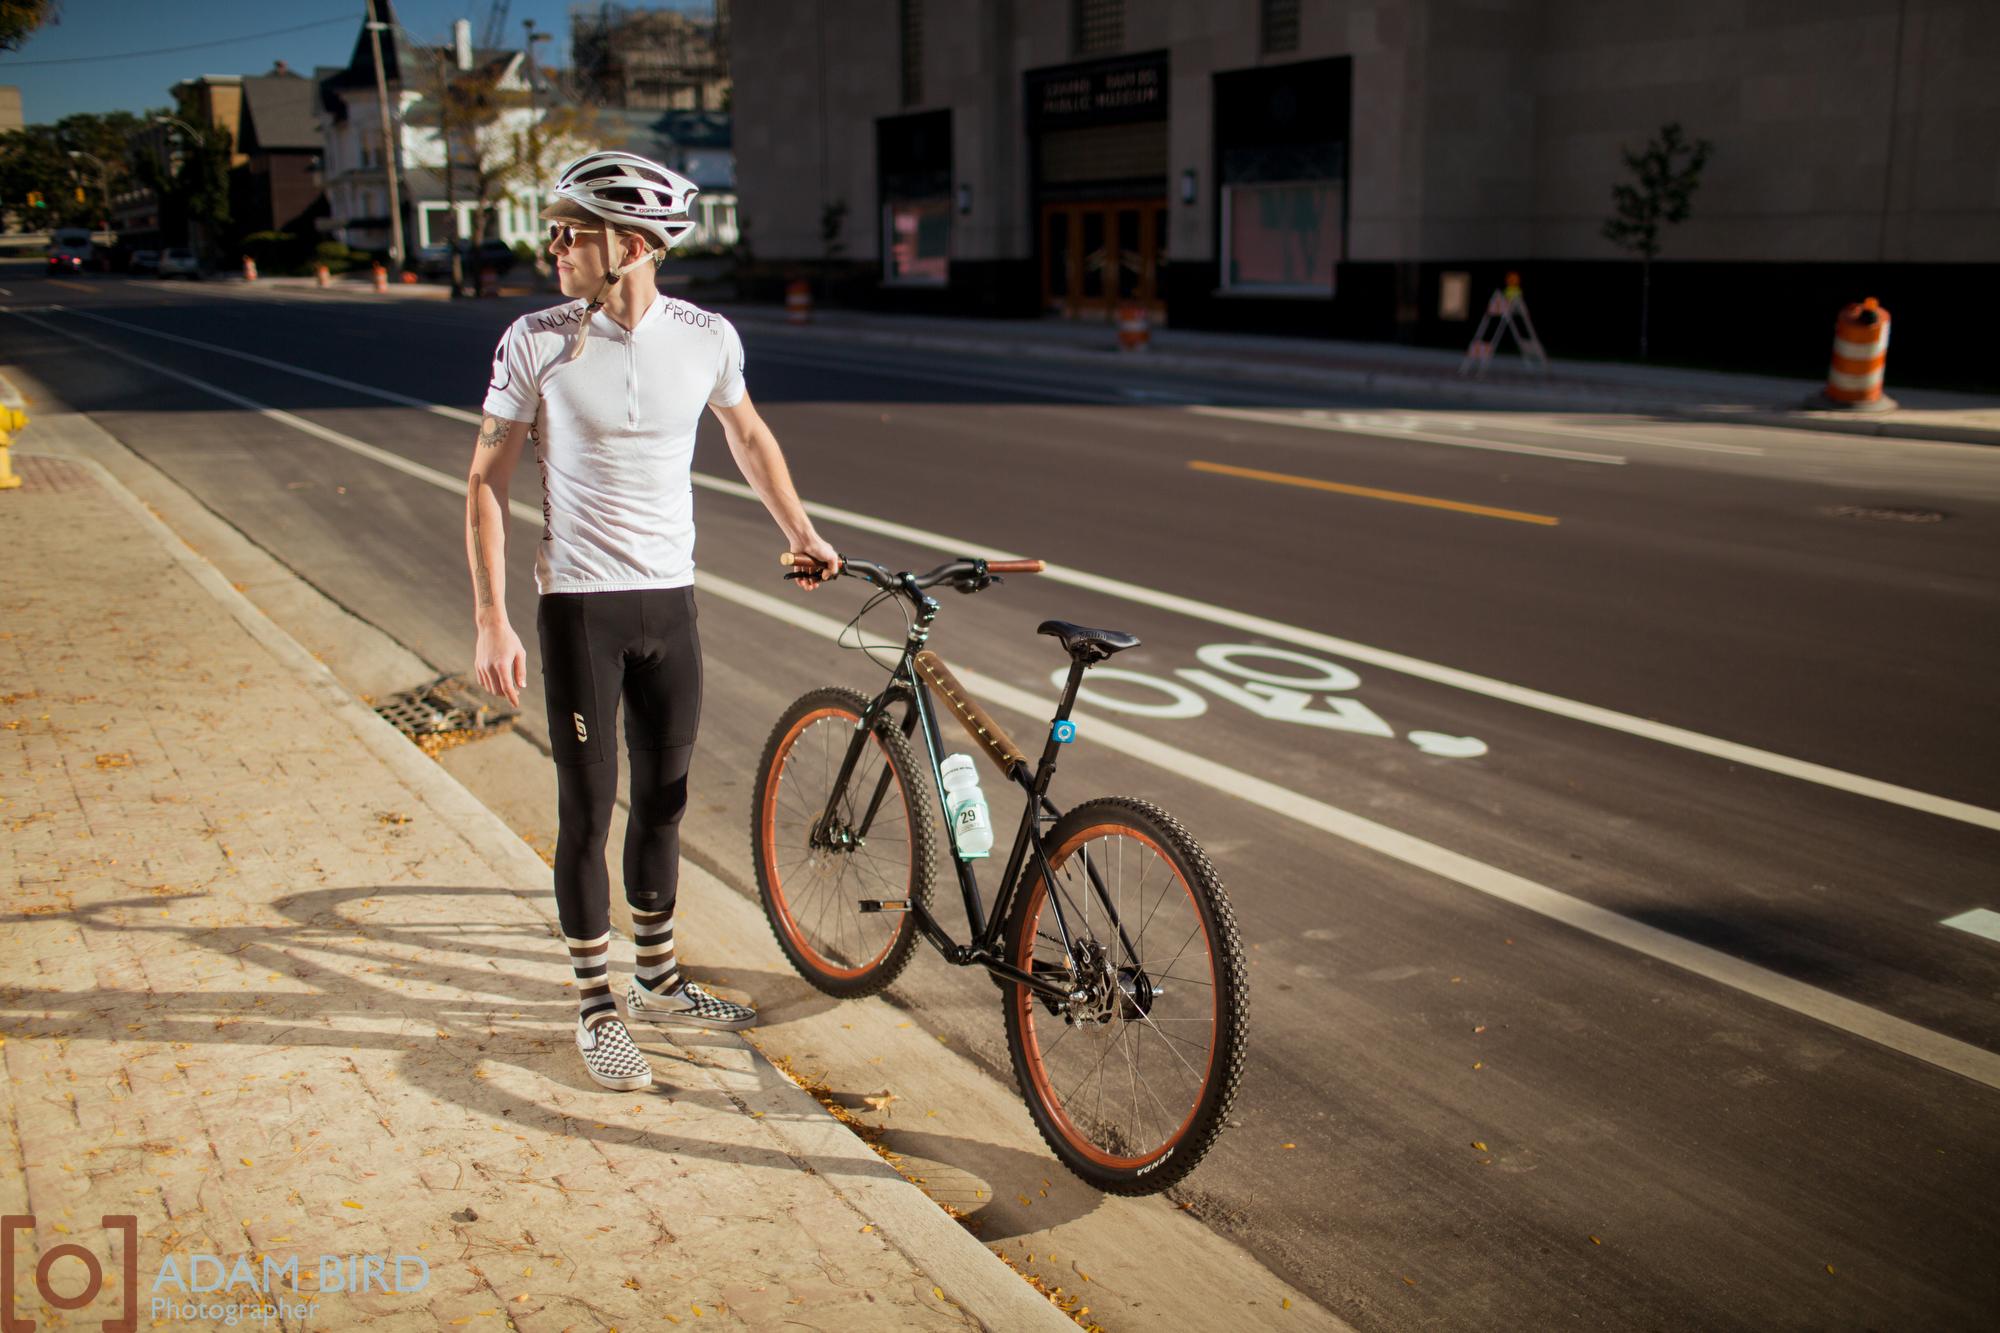 josh_mcvety_bike_lanes_00.JPG